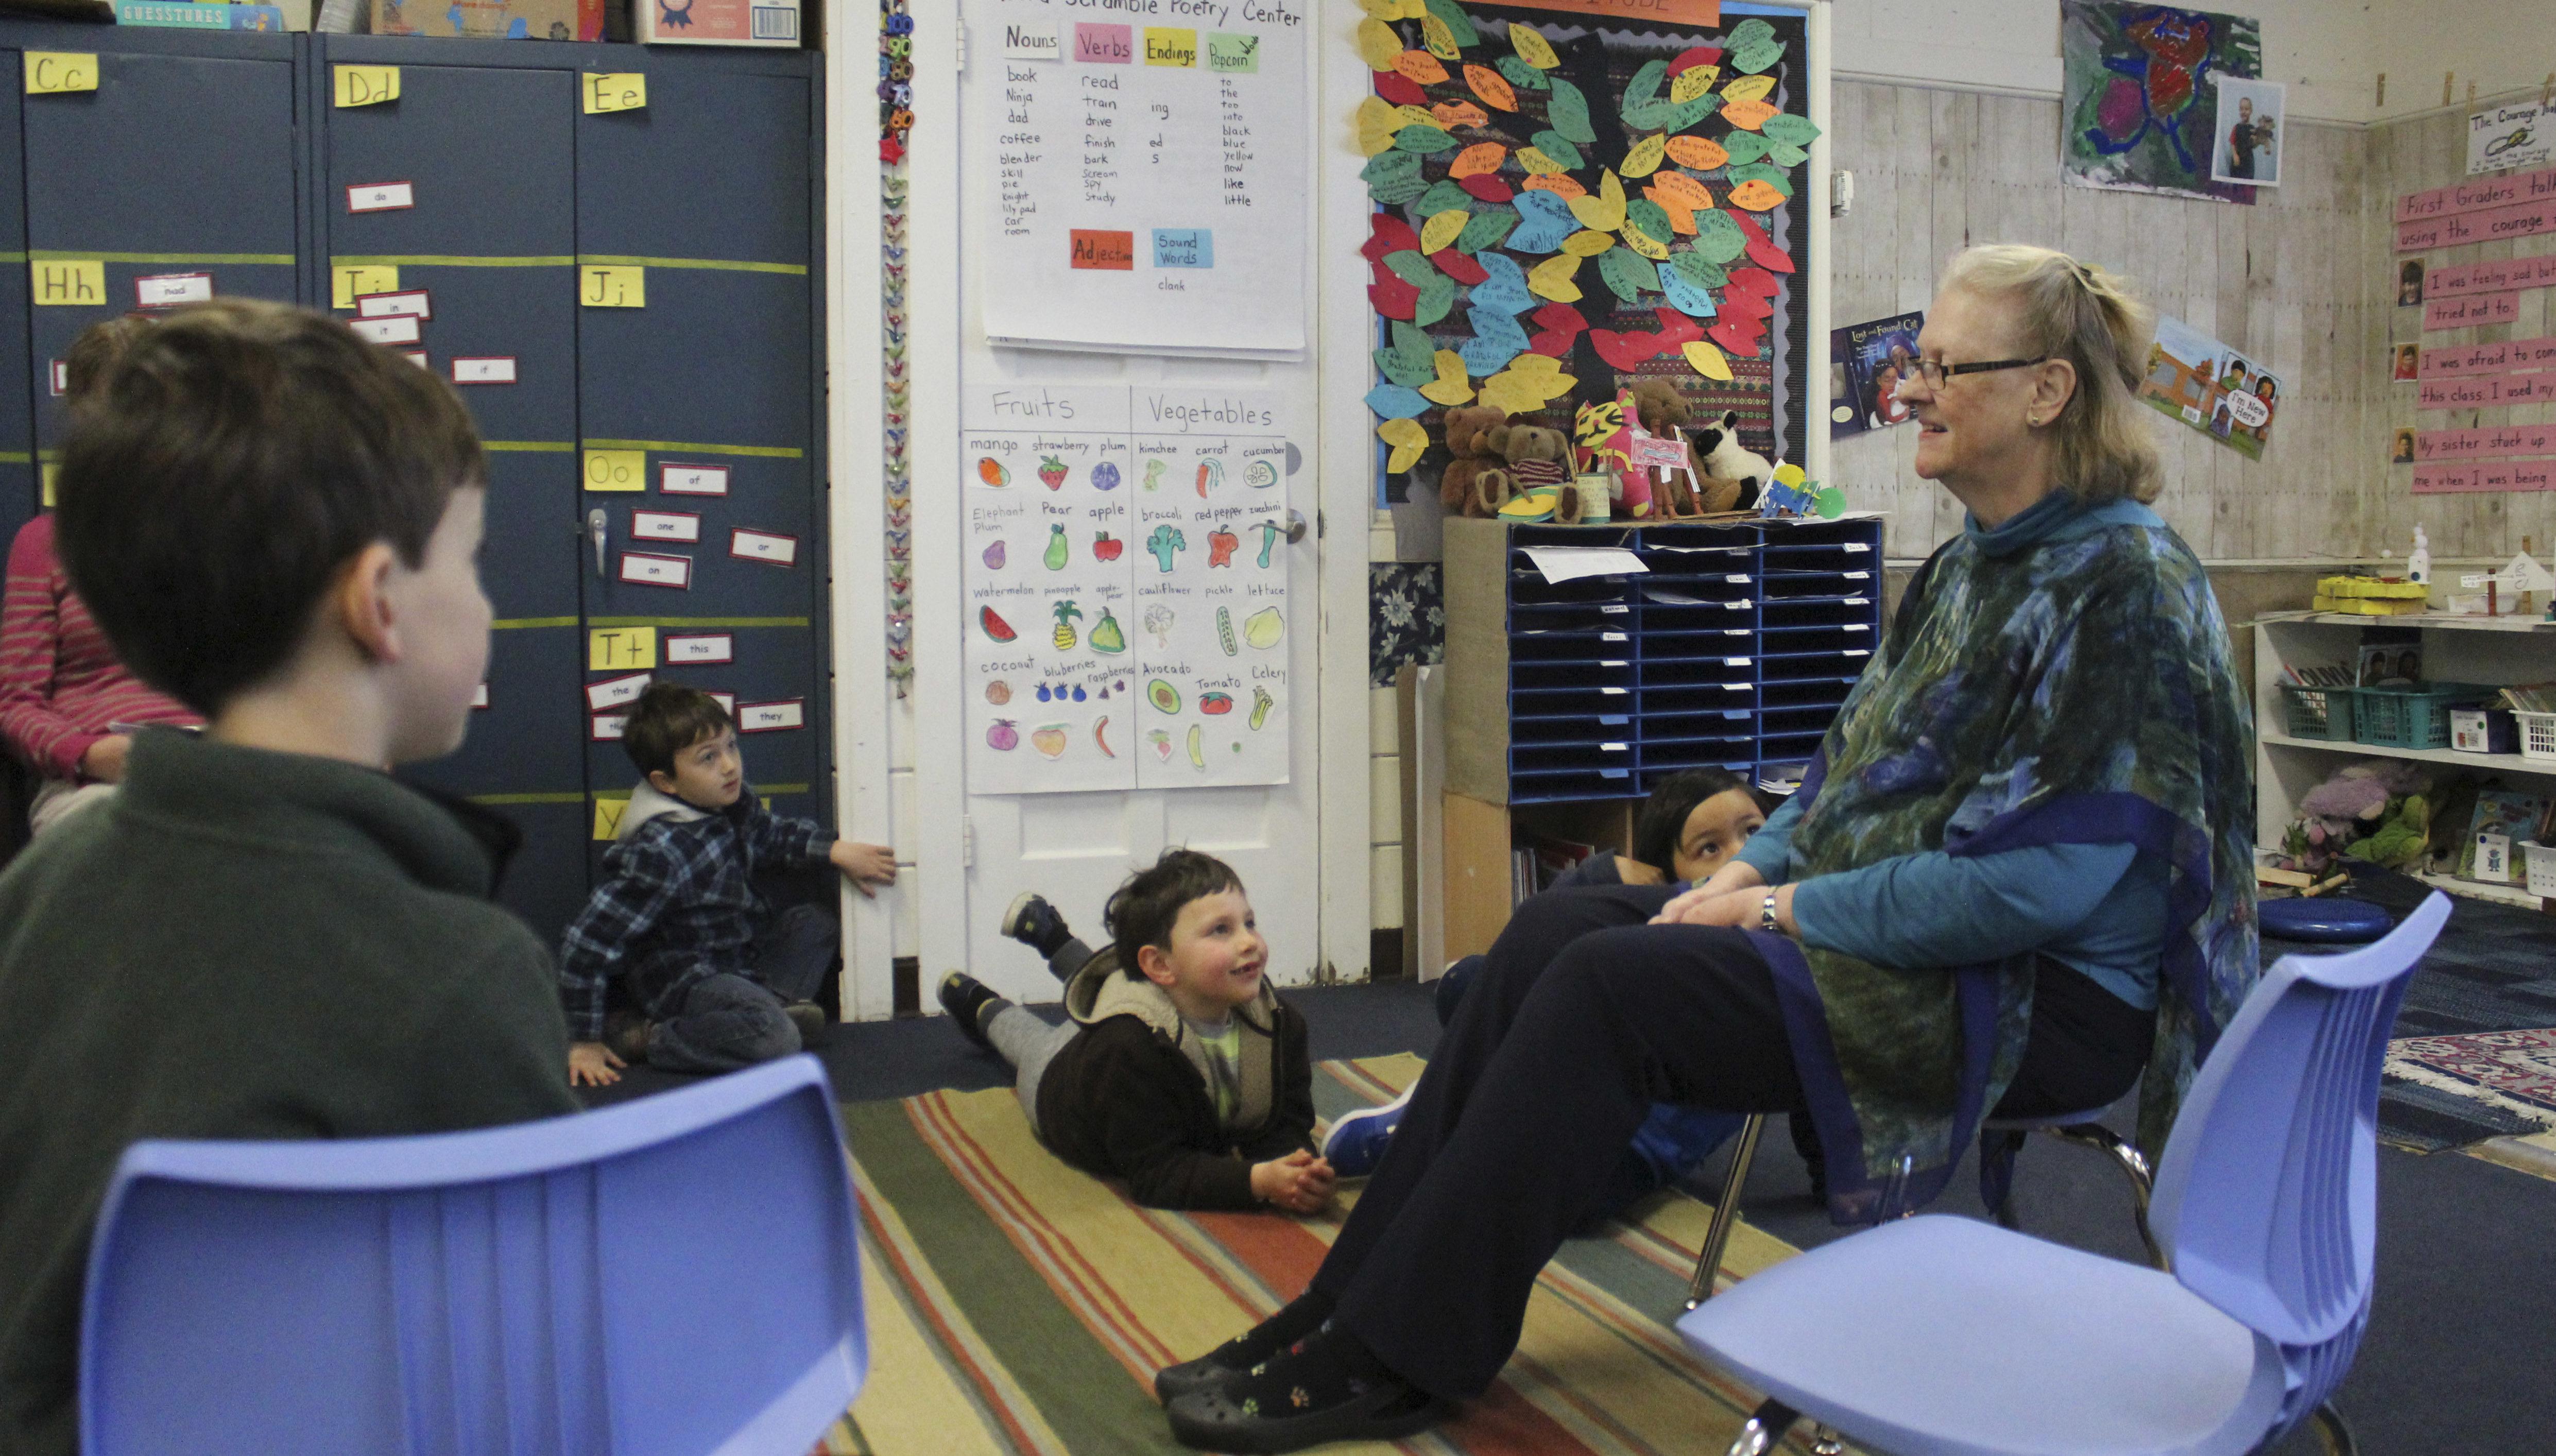 Linda Riff, interim head of school at Tehiyah Day School